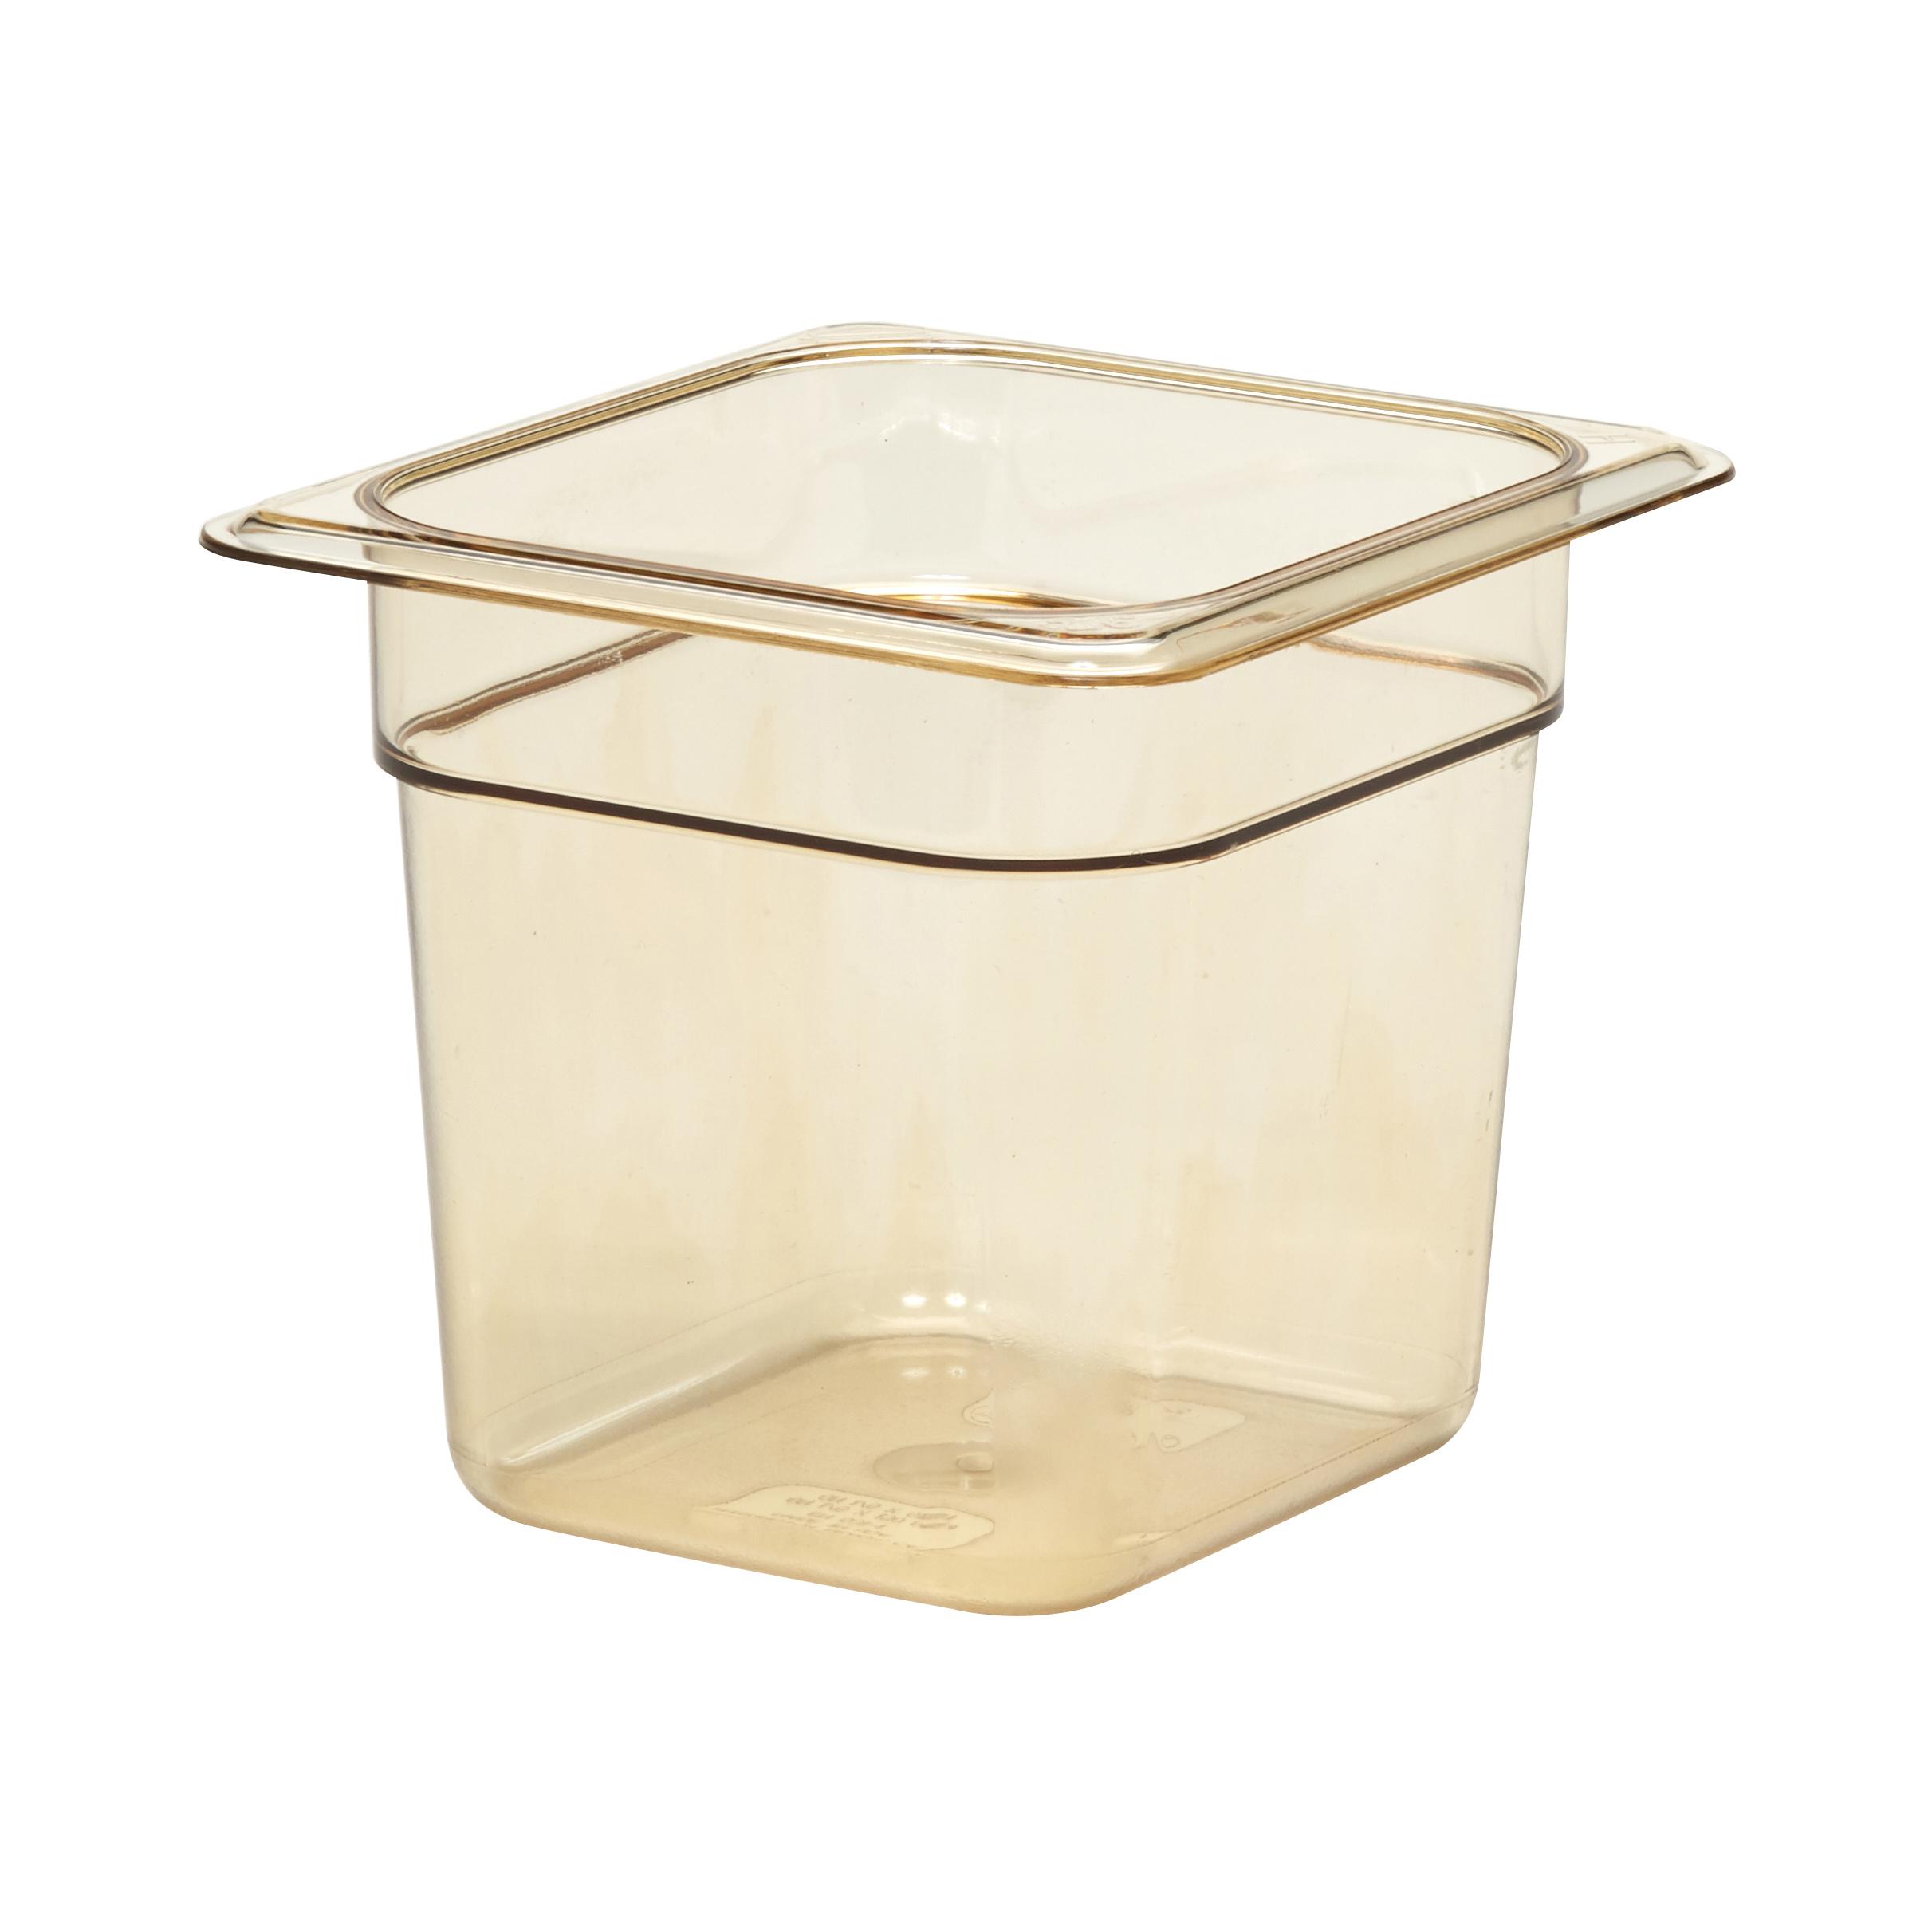 Cambro 66HP150 food/beverage storage container